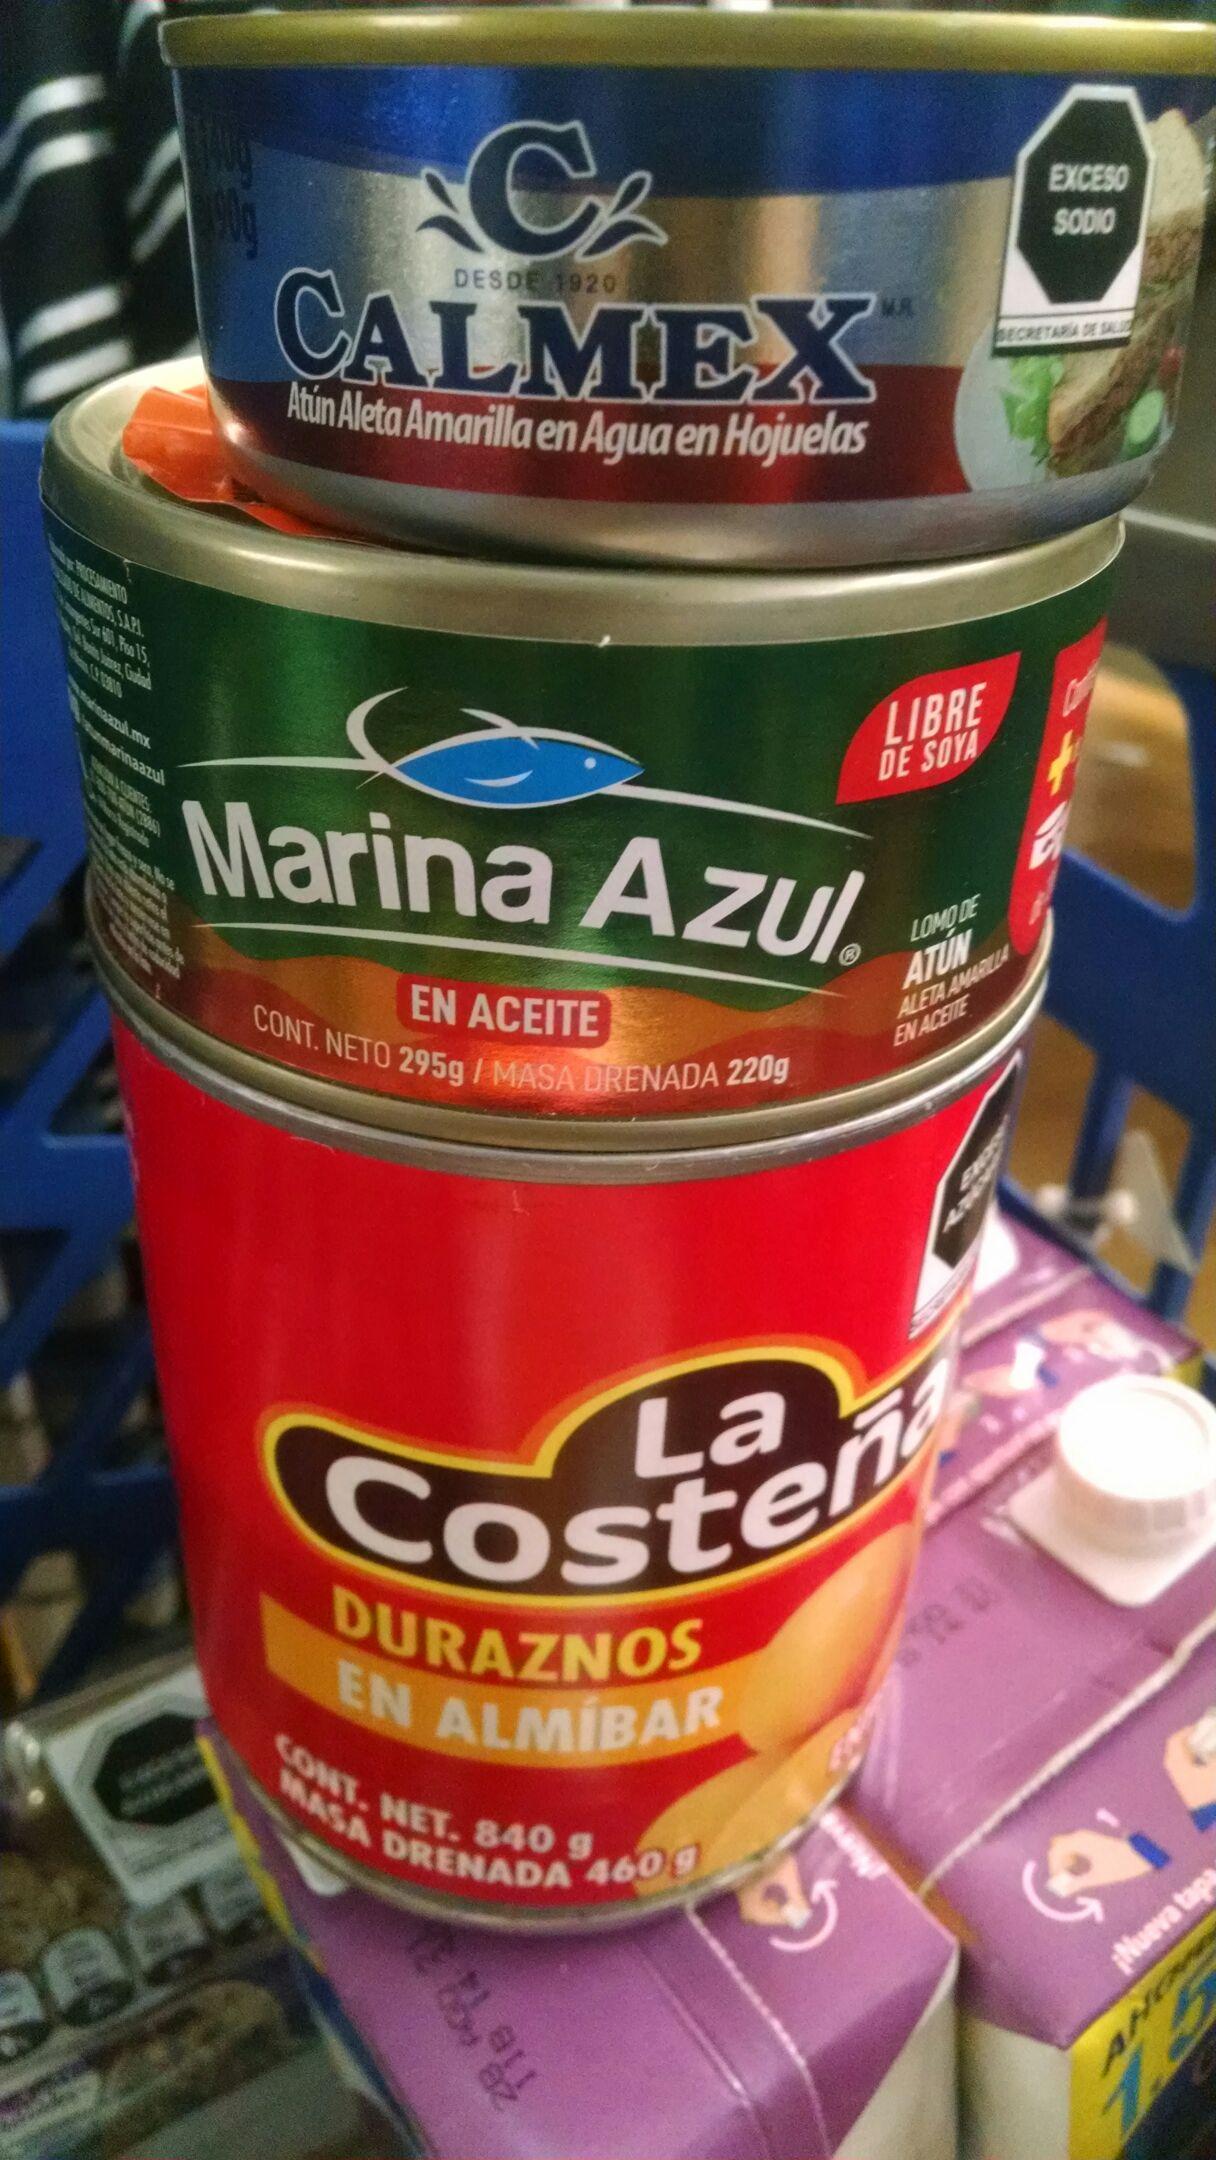 Walmart Mexicali: atún, ATUN y duraznos enteros